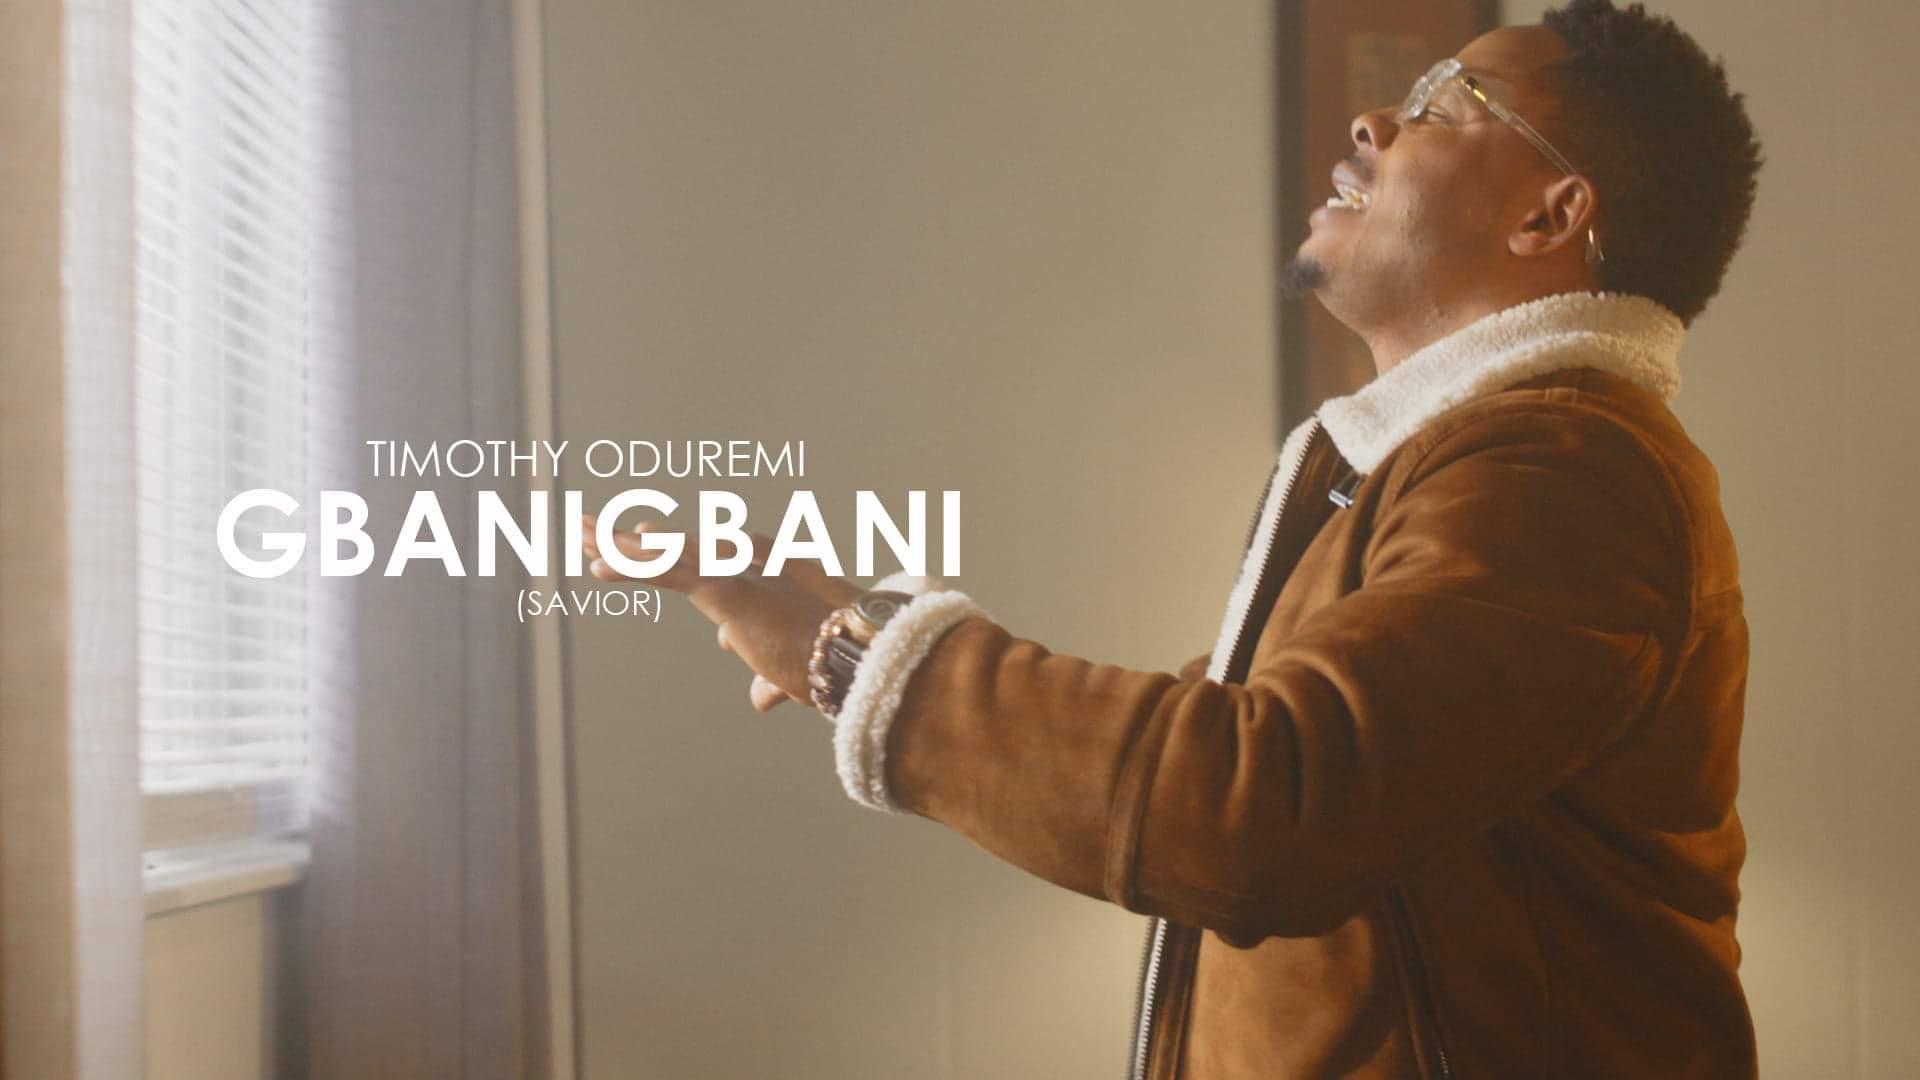 Timothy Oduremi - Gbanigbani